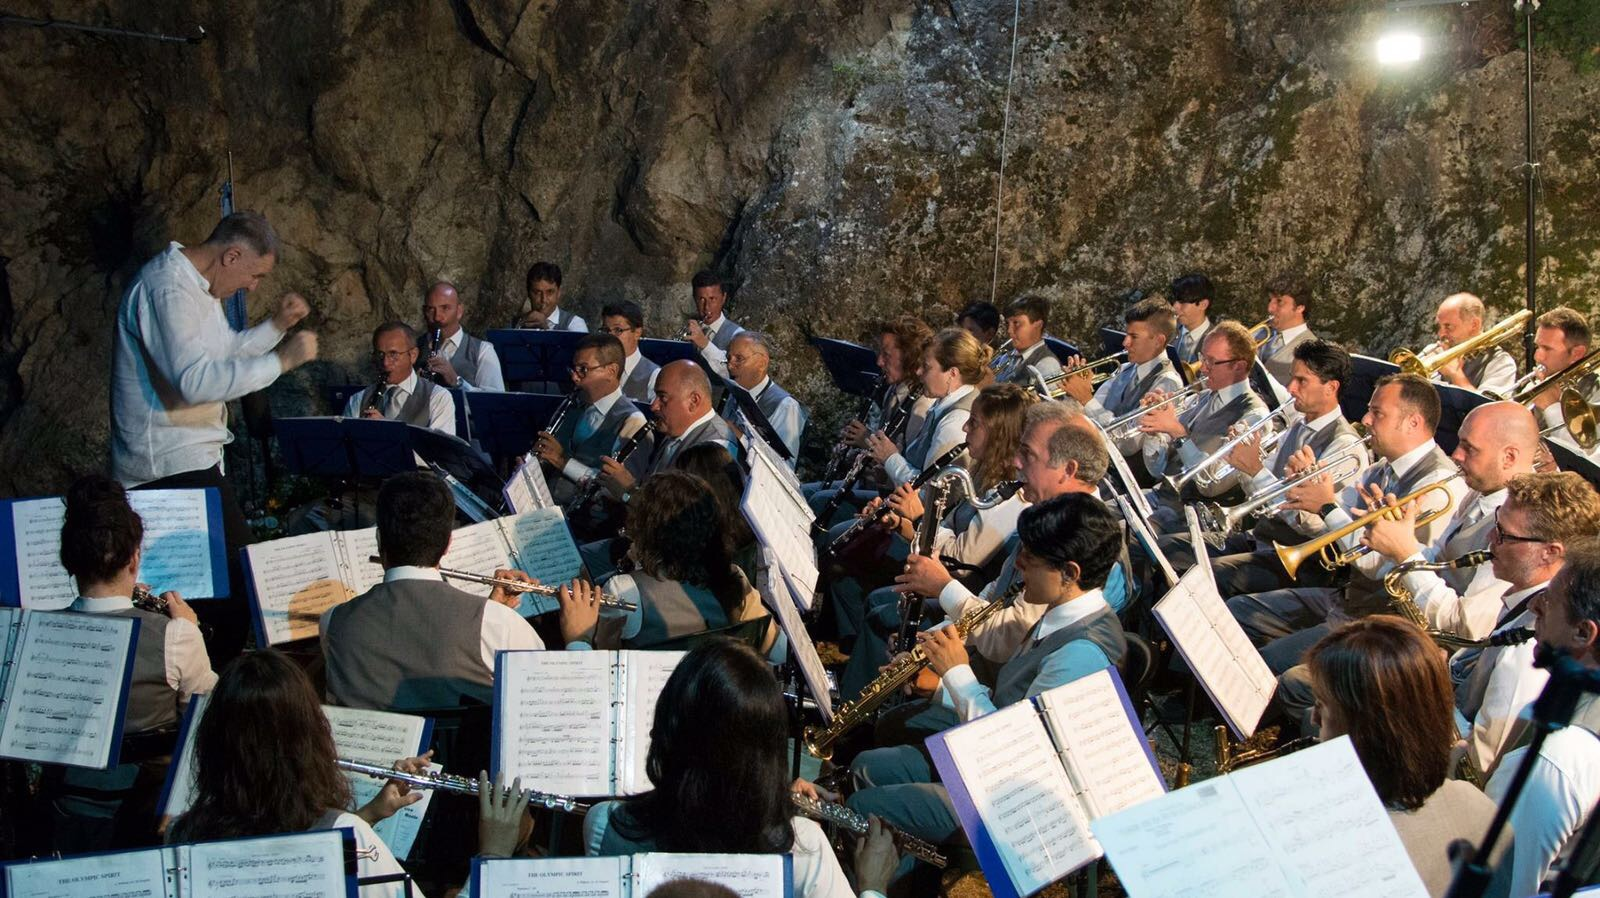 Grande successo per il week end in musica di Pietrasanta